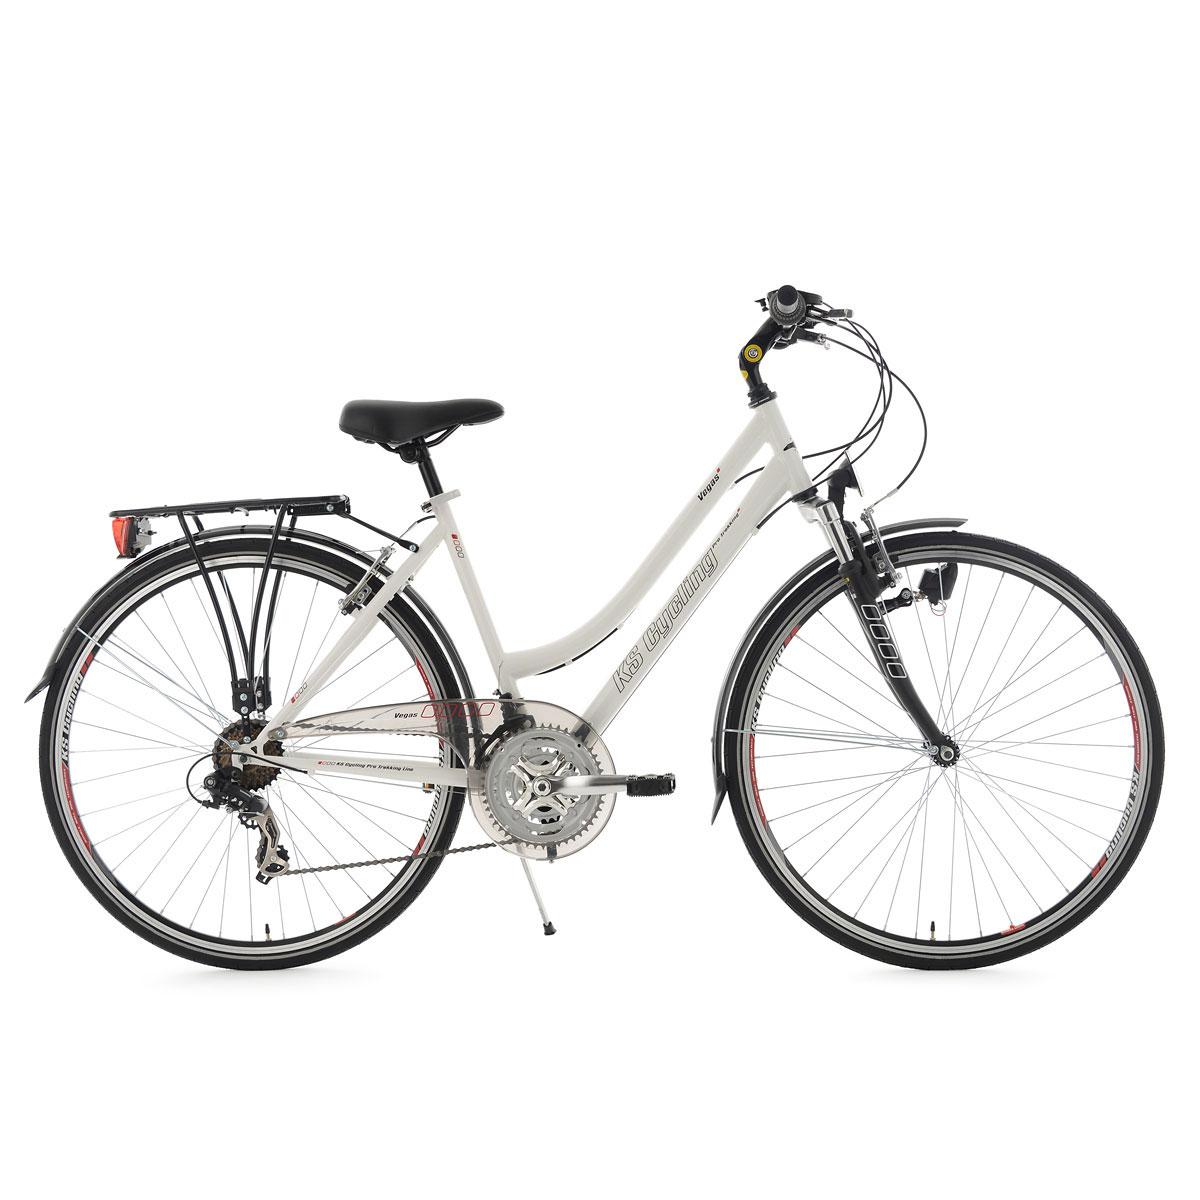 "Trekkingrad ""Vegas"", Damen, Flachlenker, 48cm, weiß Flachlenker | Damen | weiß | 48 cm"